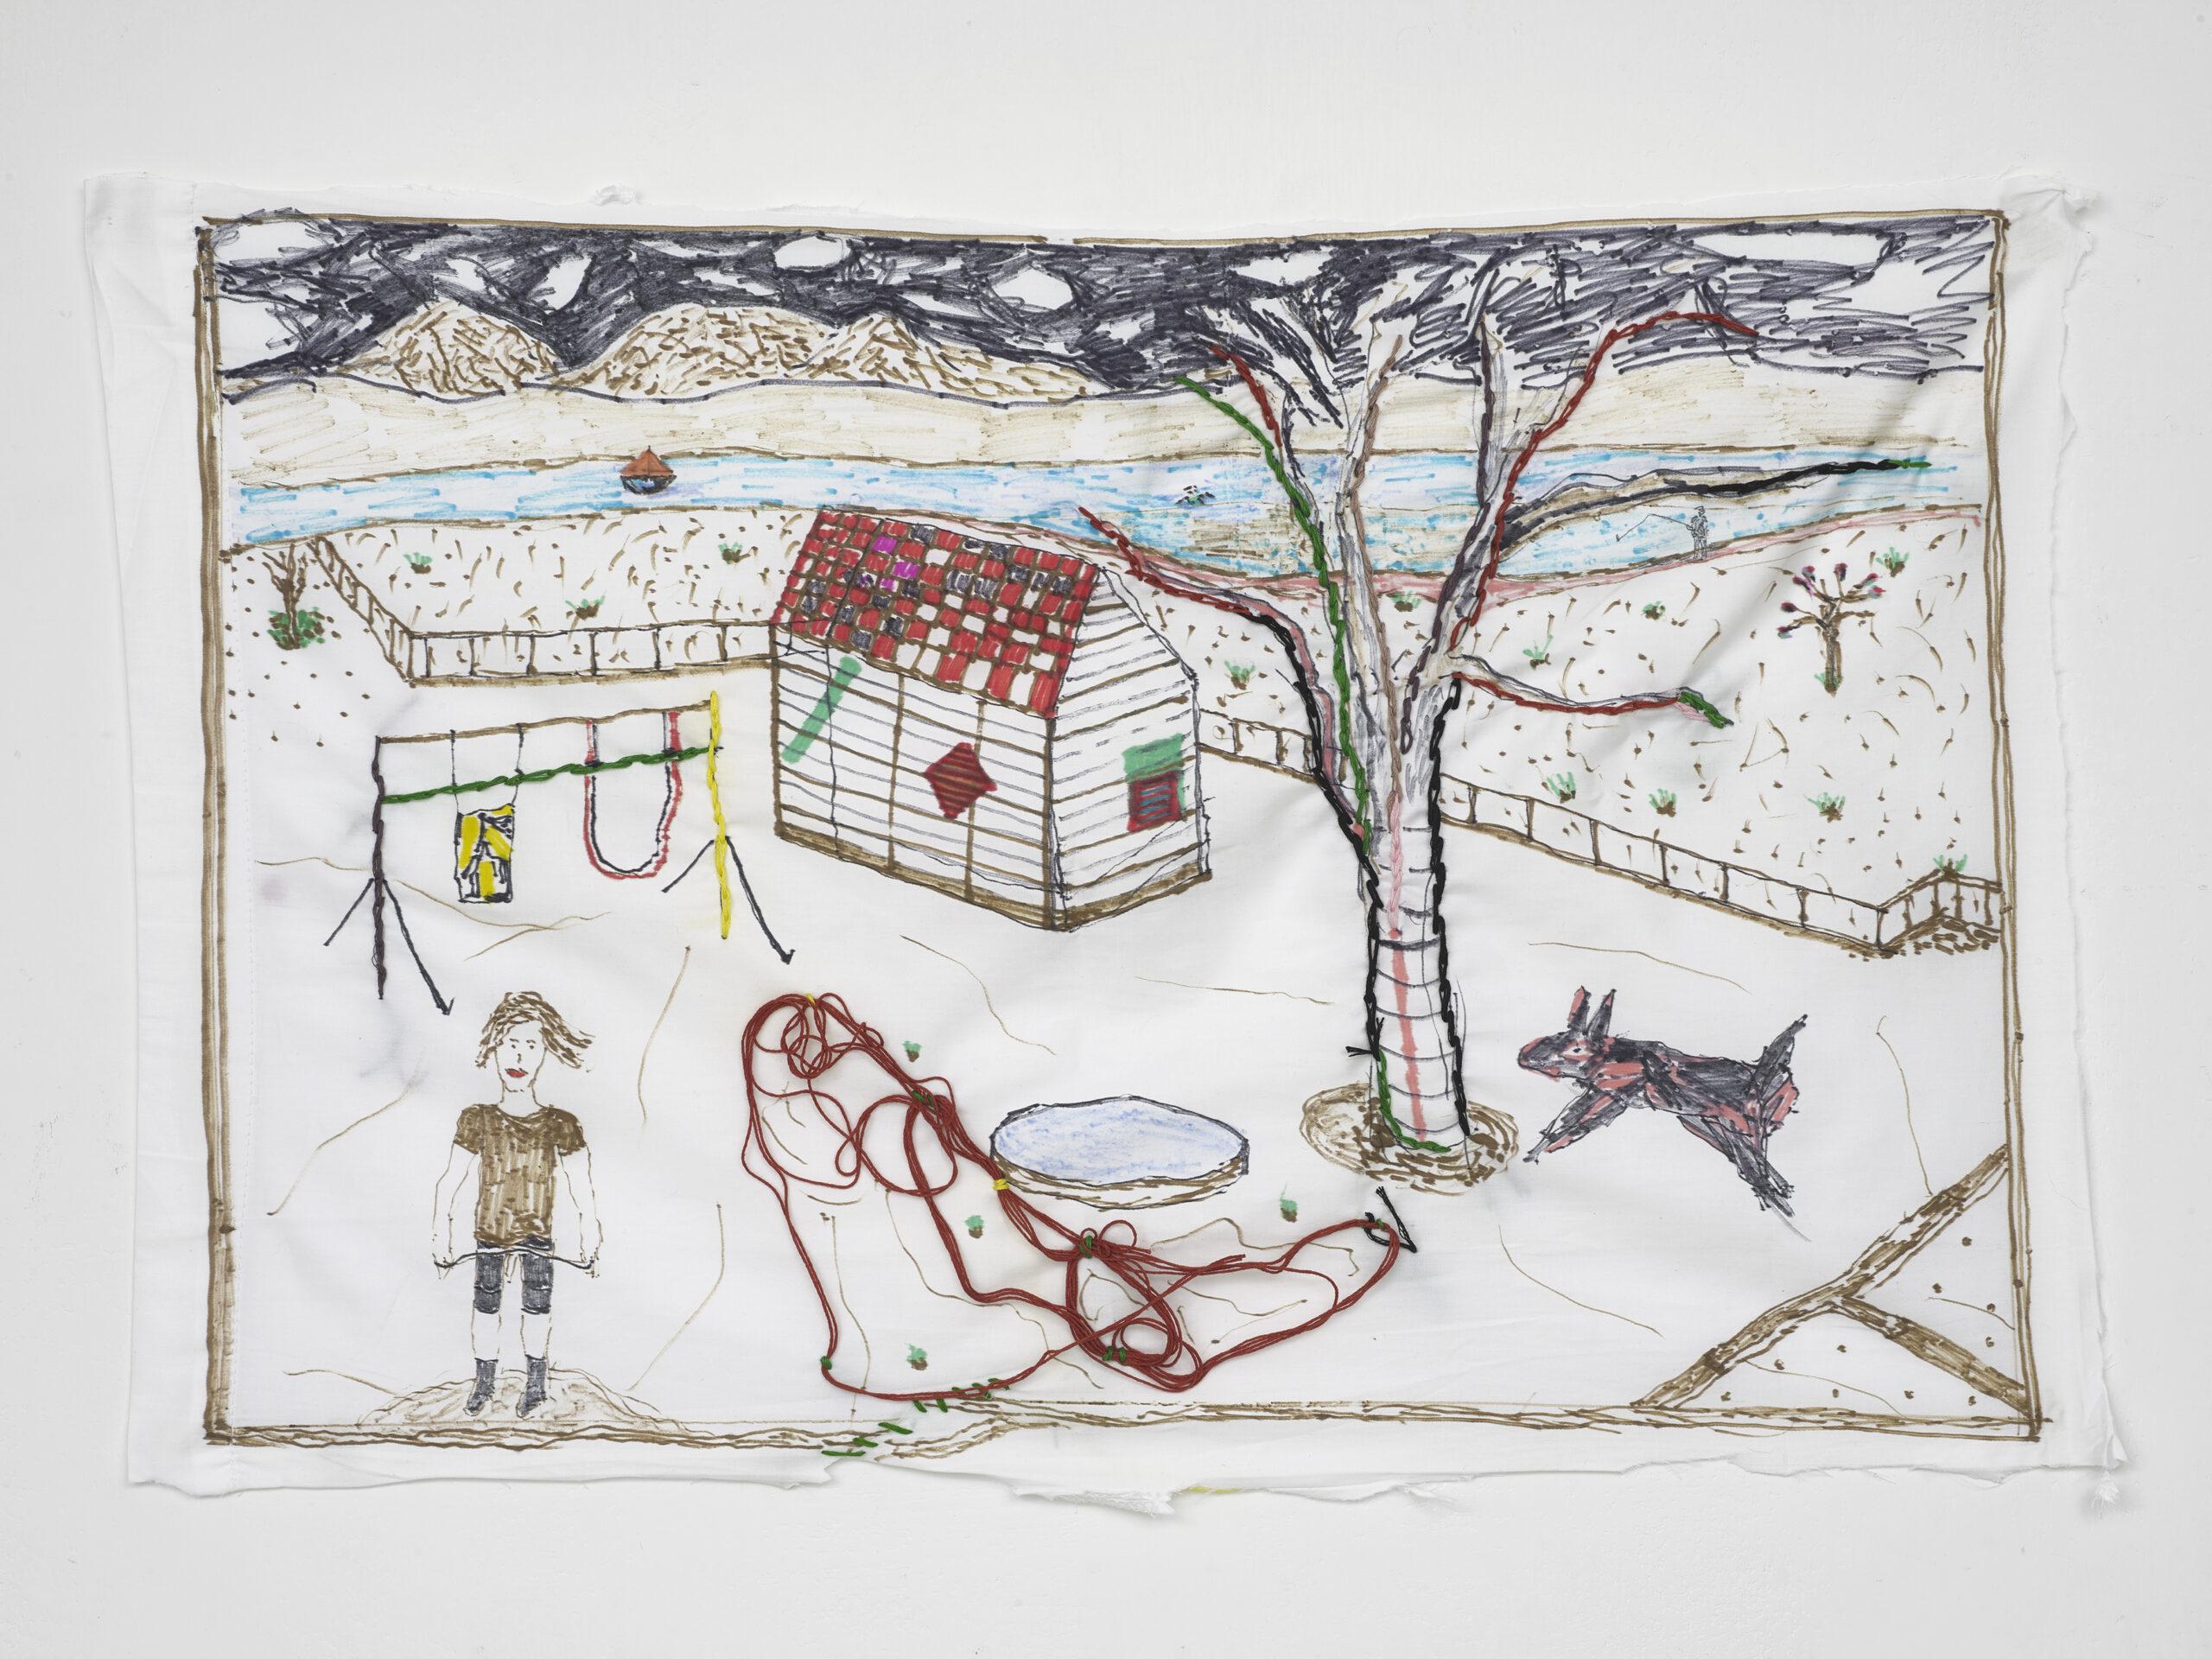 Brian Dawn Chalkley Swedish hut (2020) Pencil, felt tip and thread on cotton pillow case, 75 cm x 45 cm.